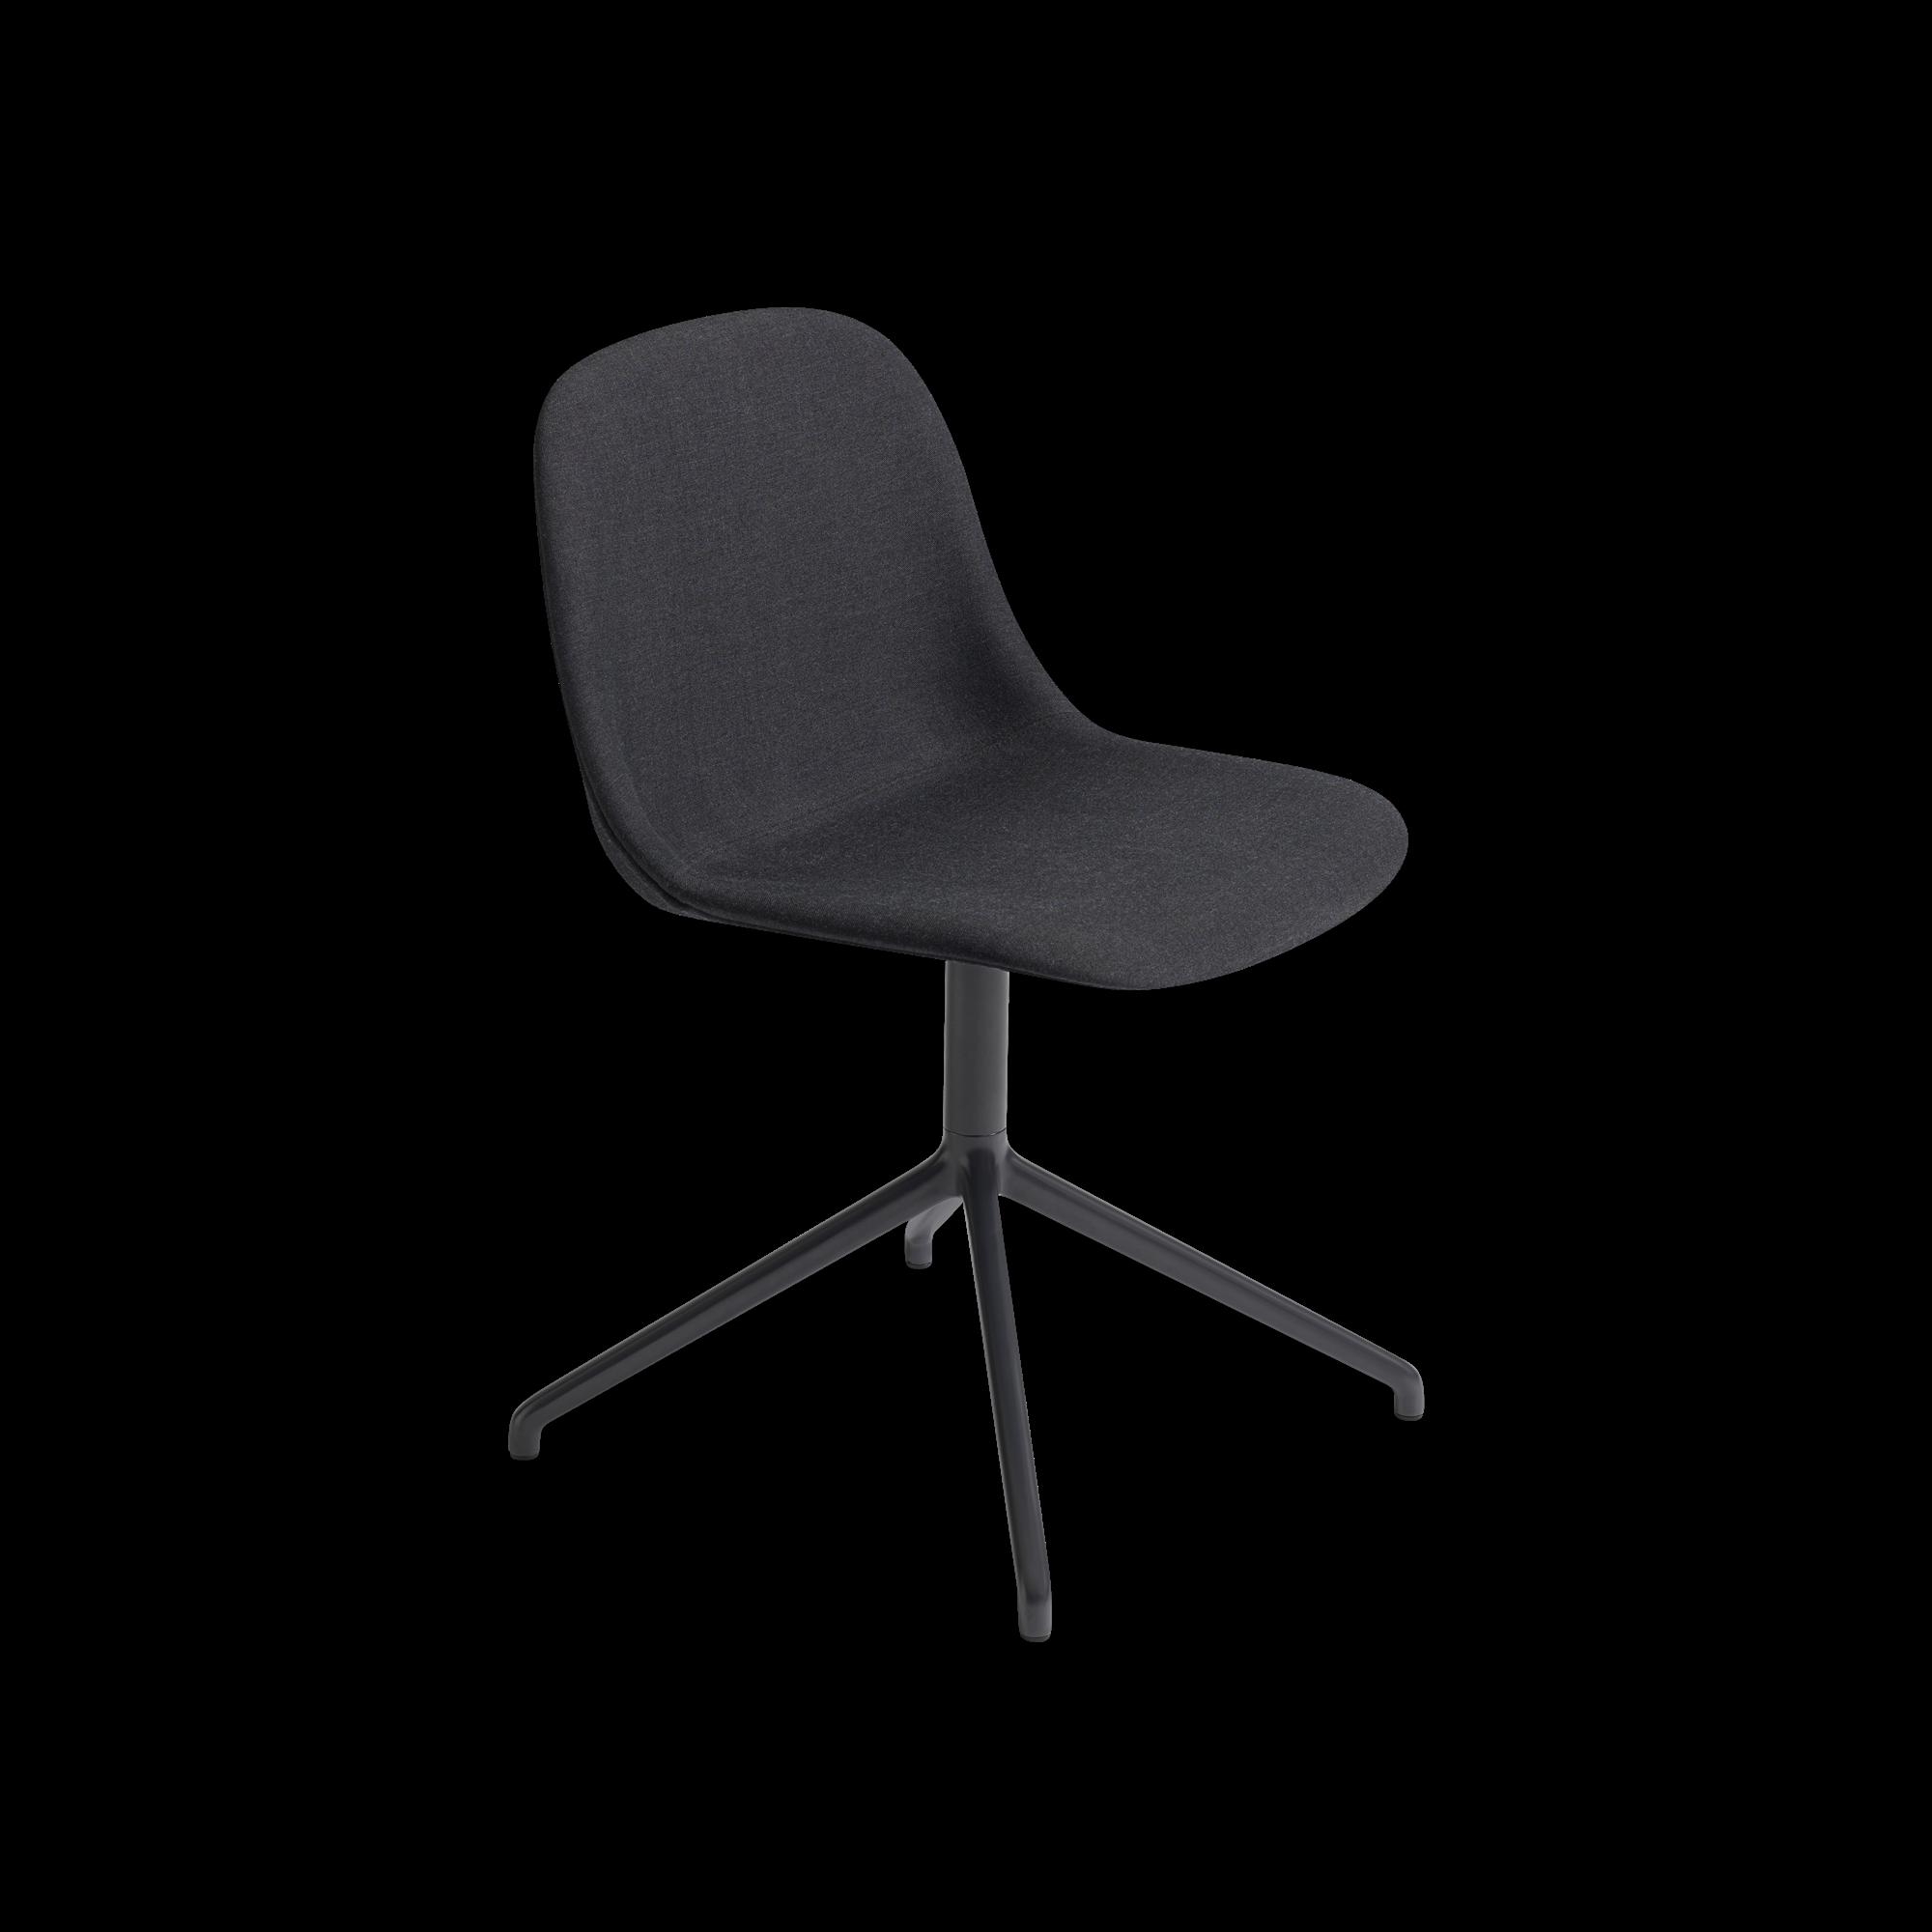 Fiber side chair swivel base w.o. return-8